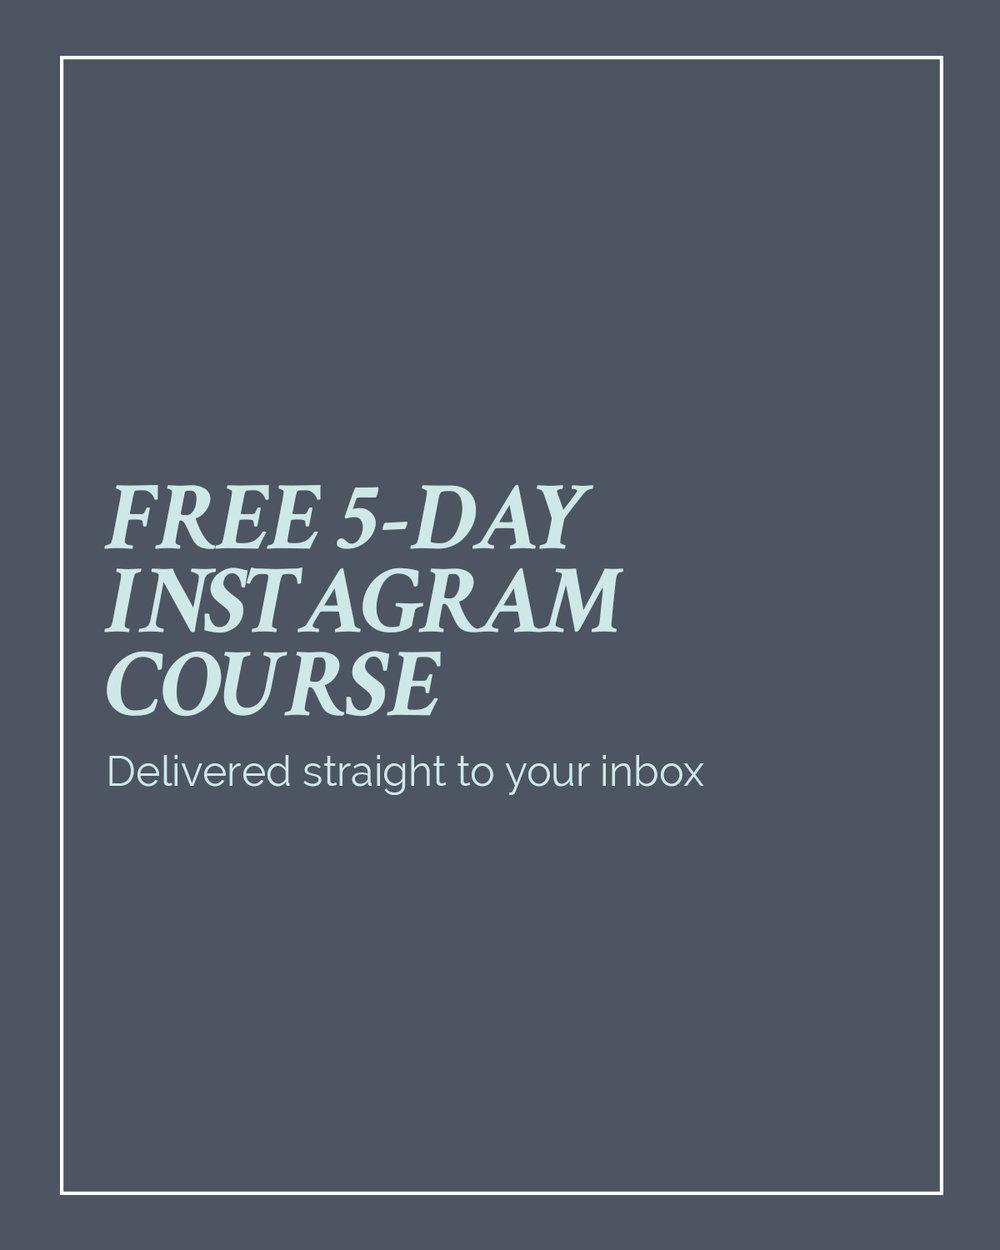 5-day-day-Instagram-course.jpg